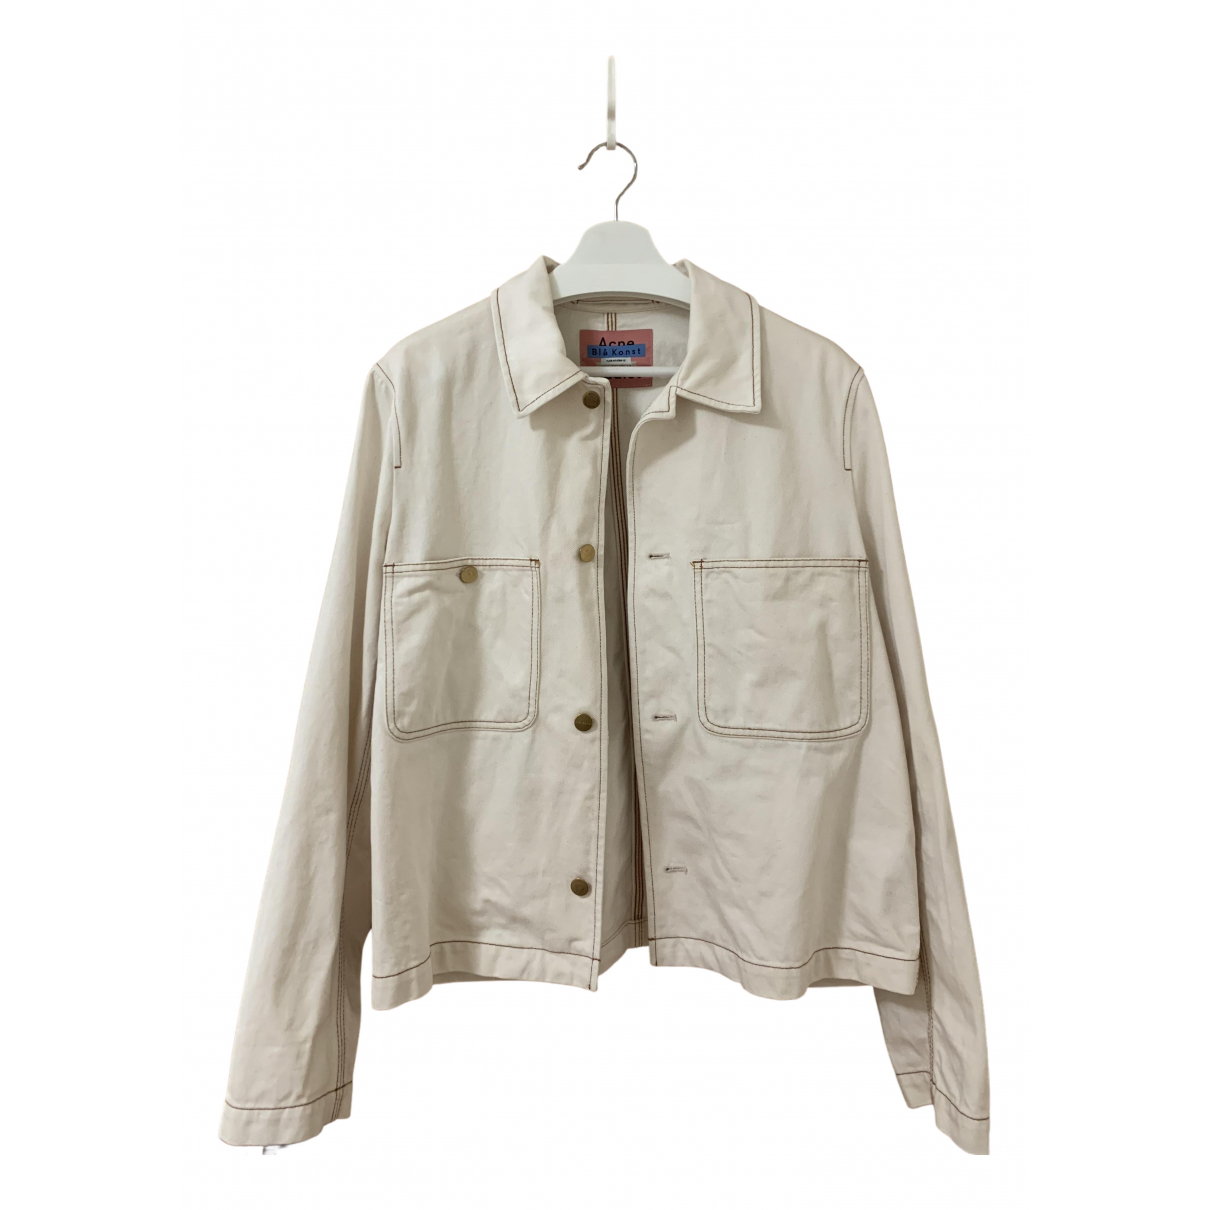 Acne Studios \N Ecru Cotton jacket  for Men XS International